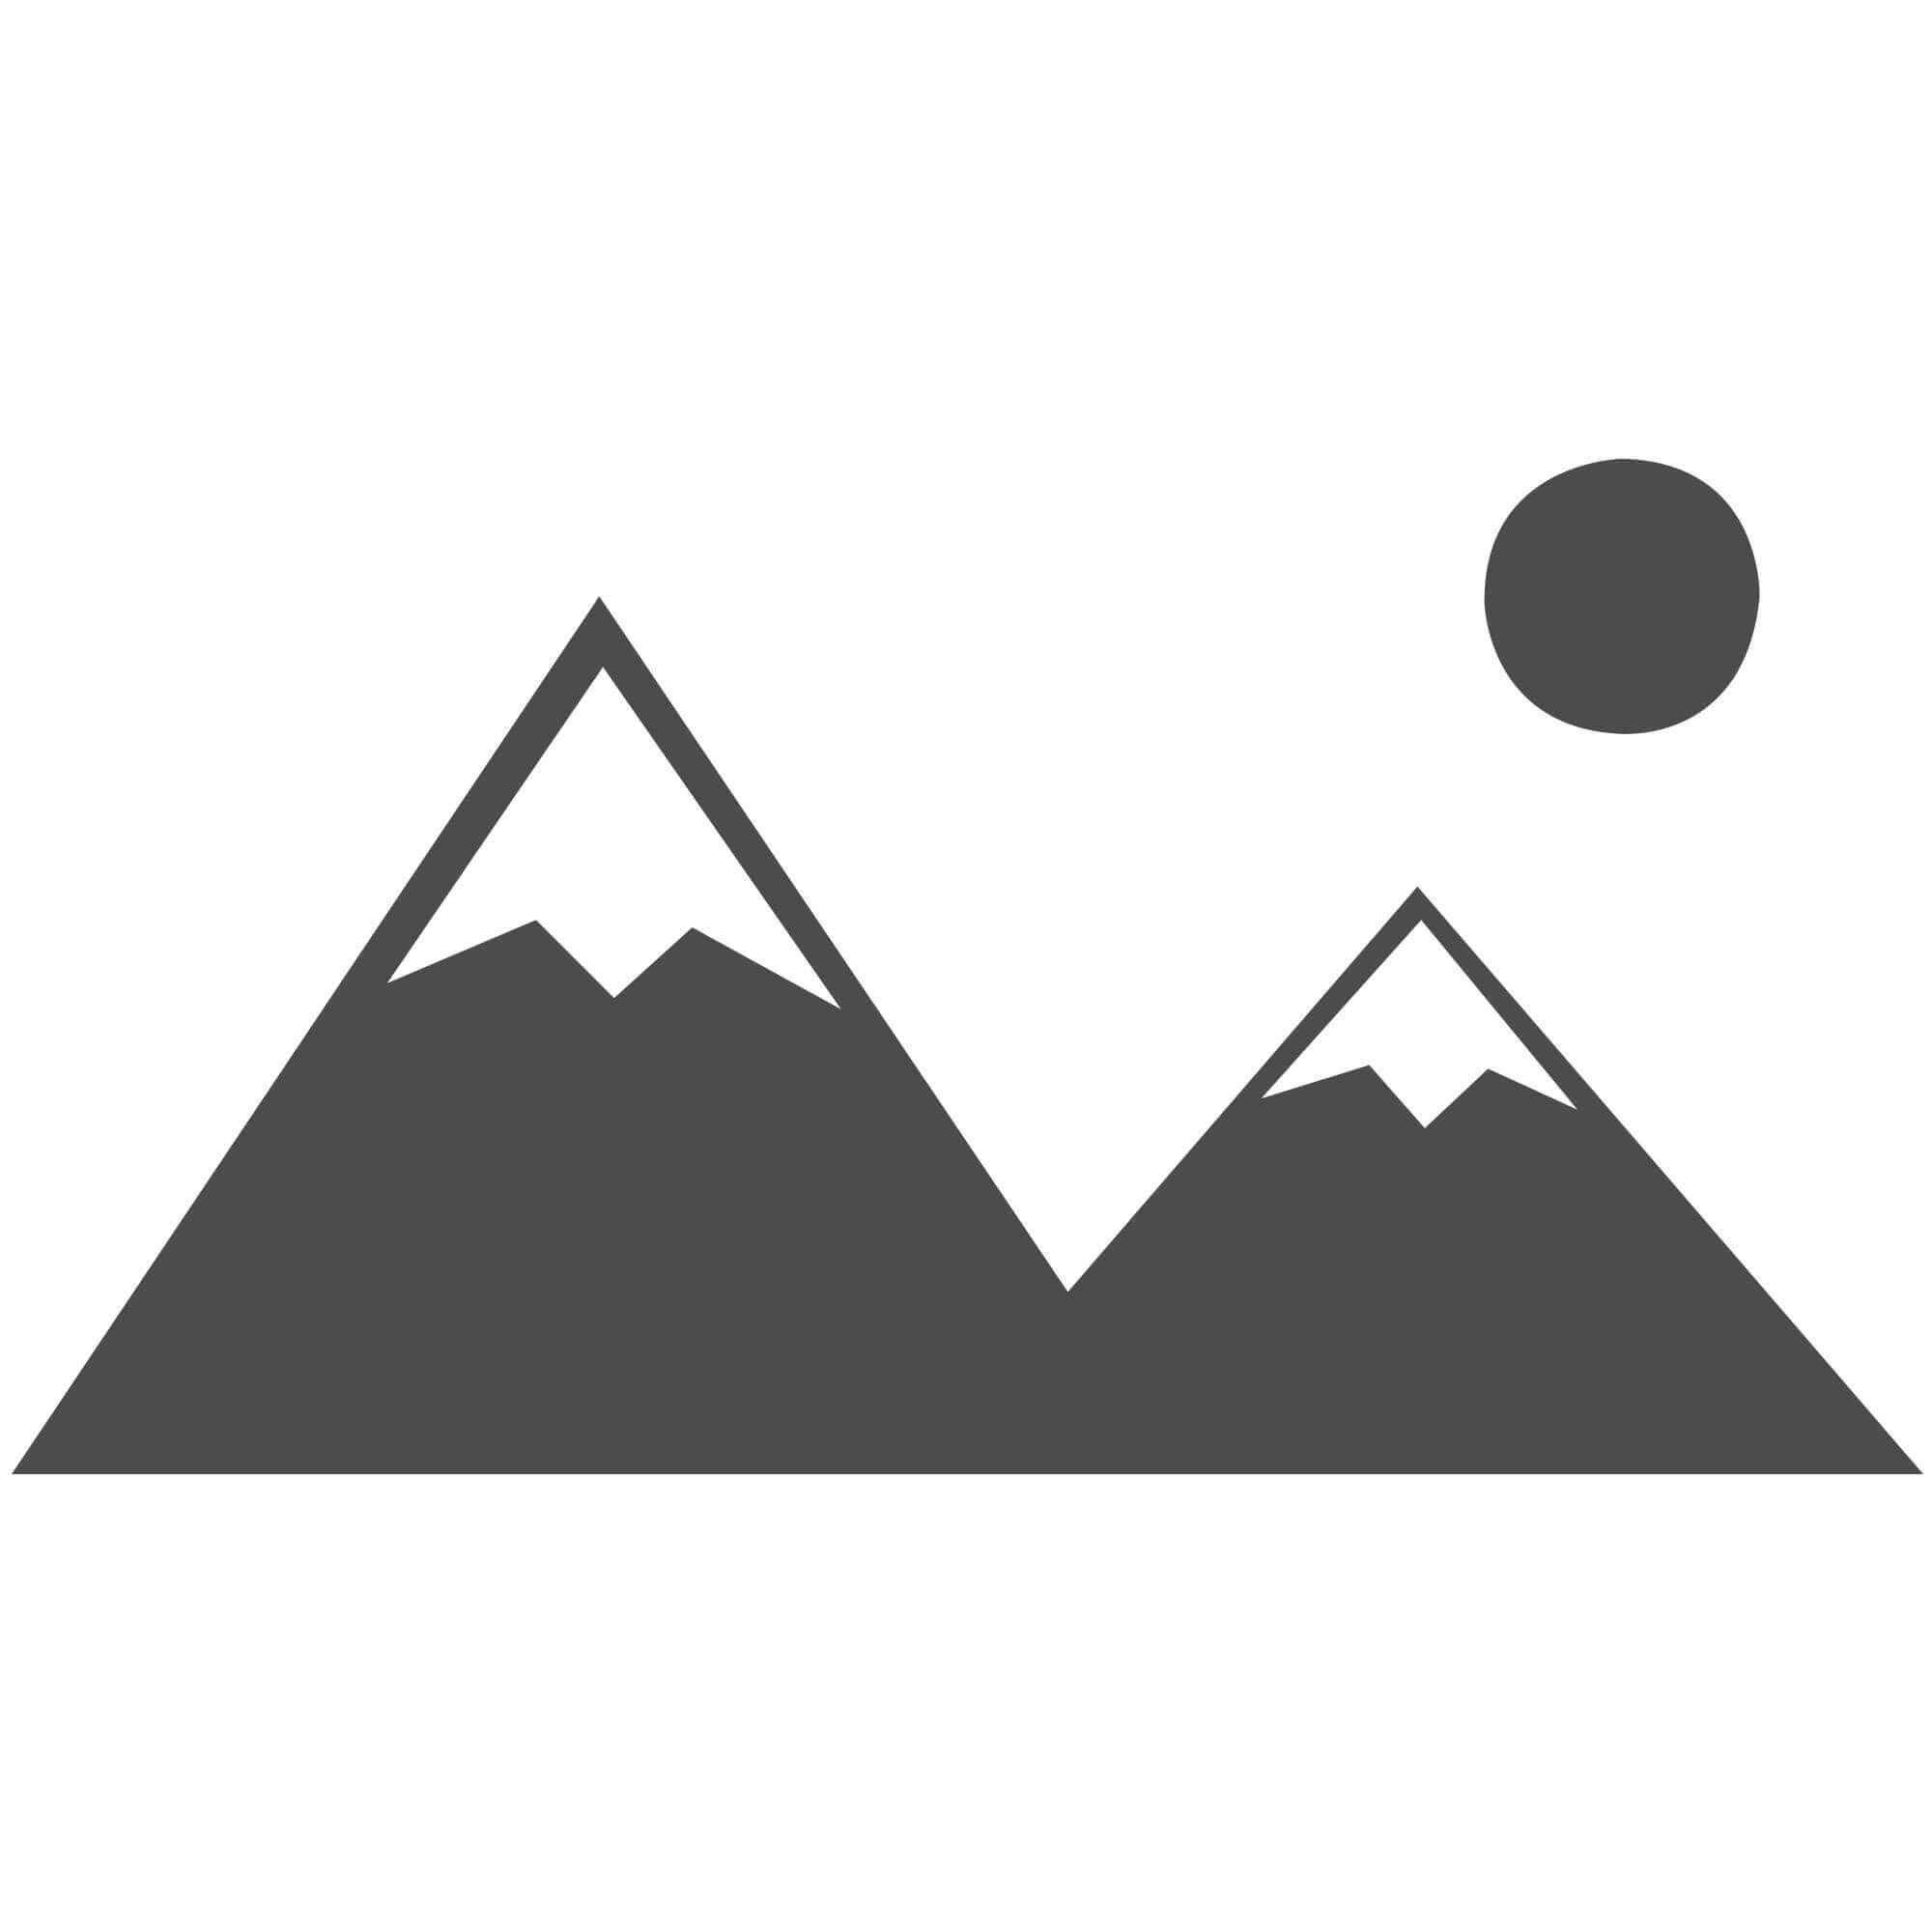 "Pearl Shaggy Dark Grey Rug-120 x 170 cm (4' x 5'7"")"